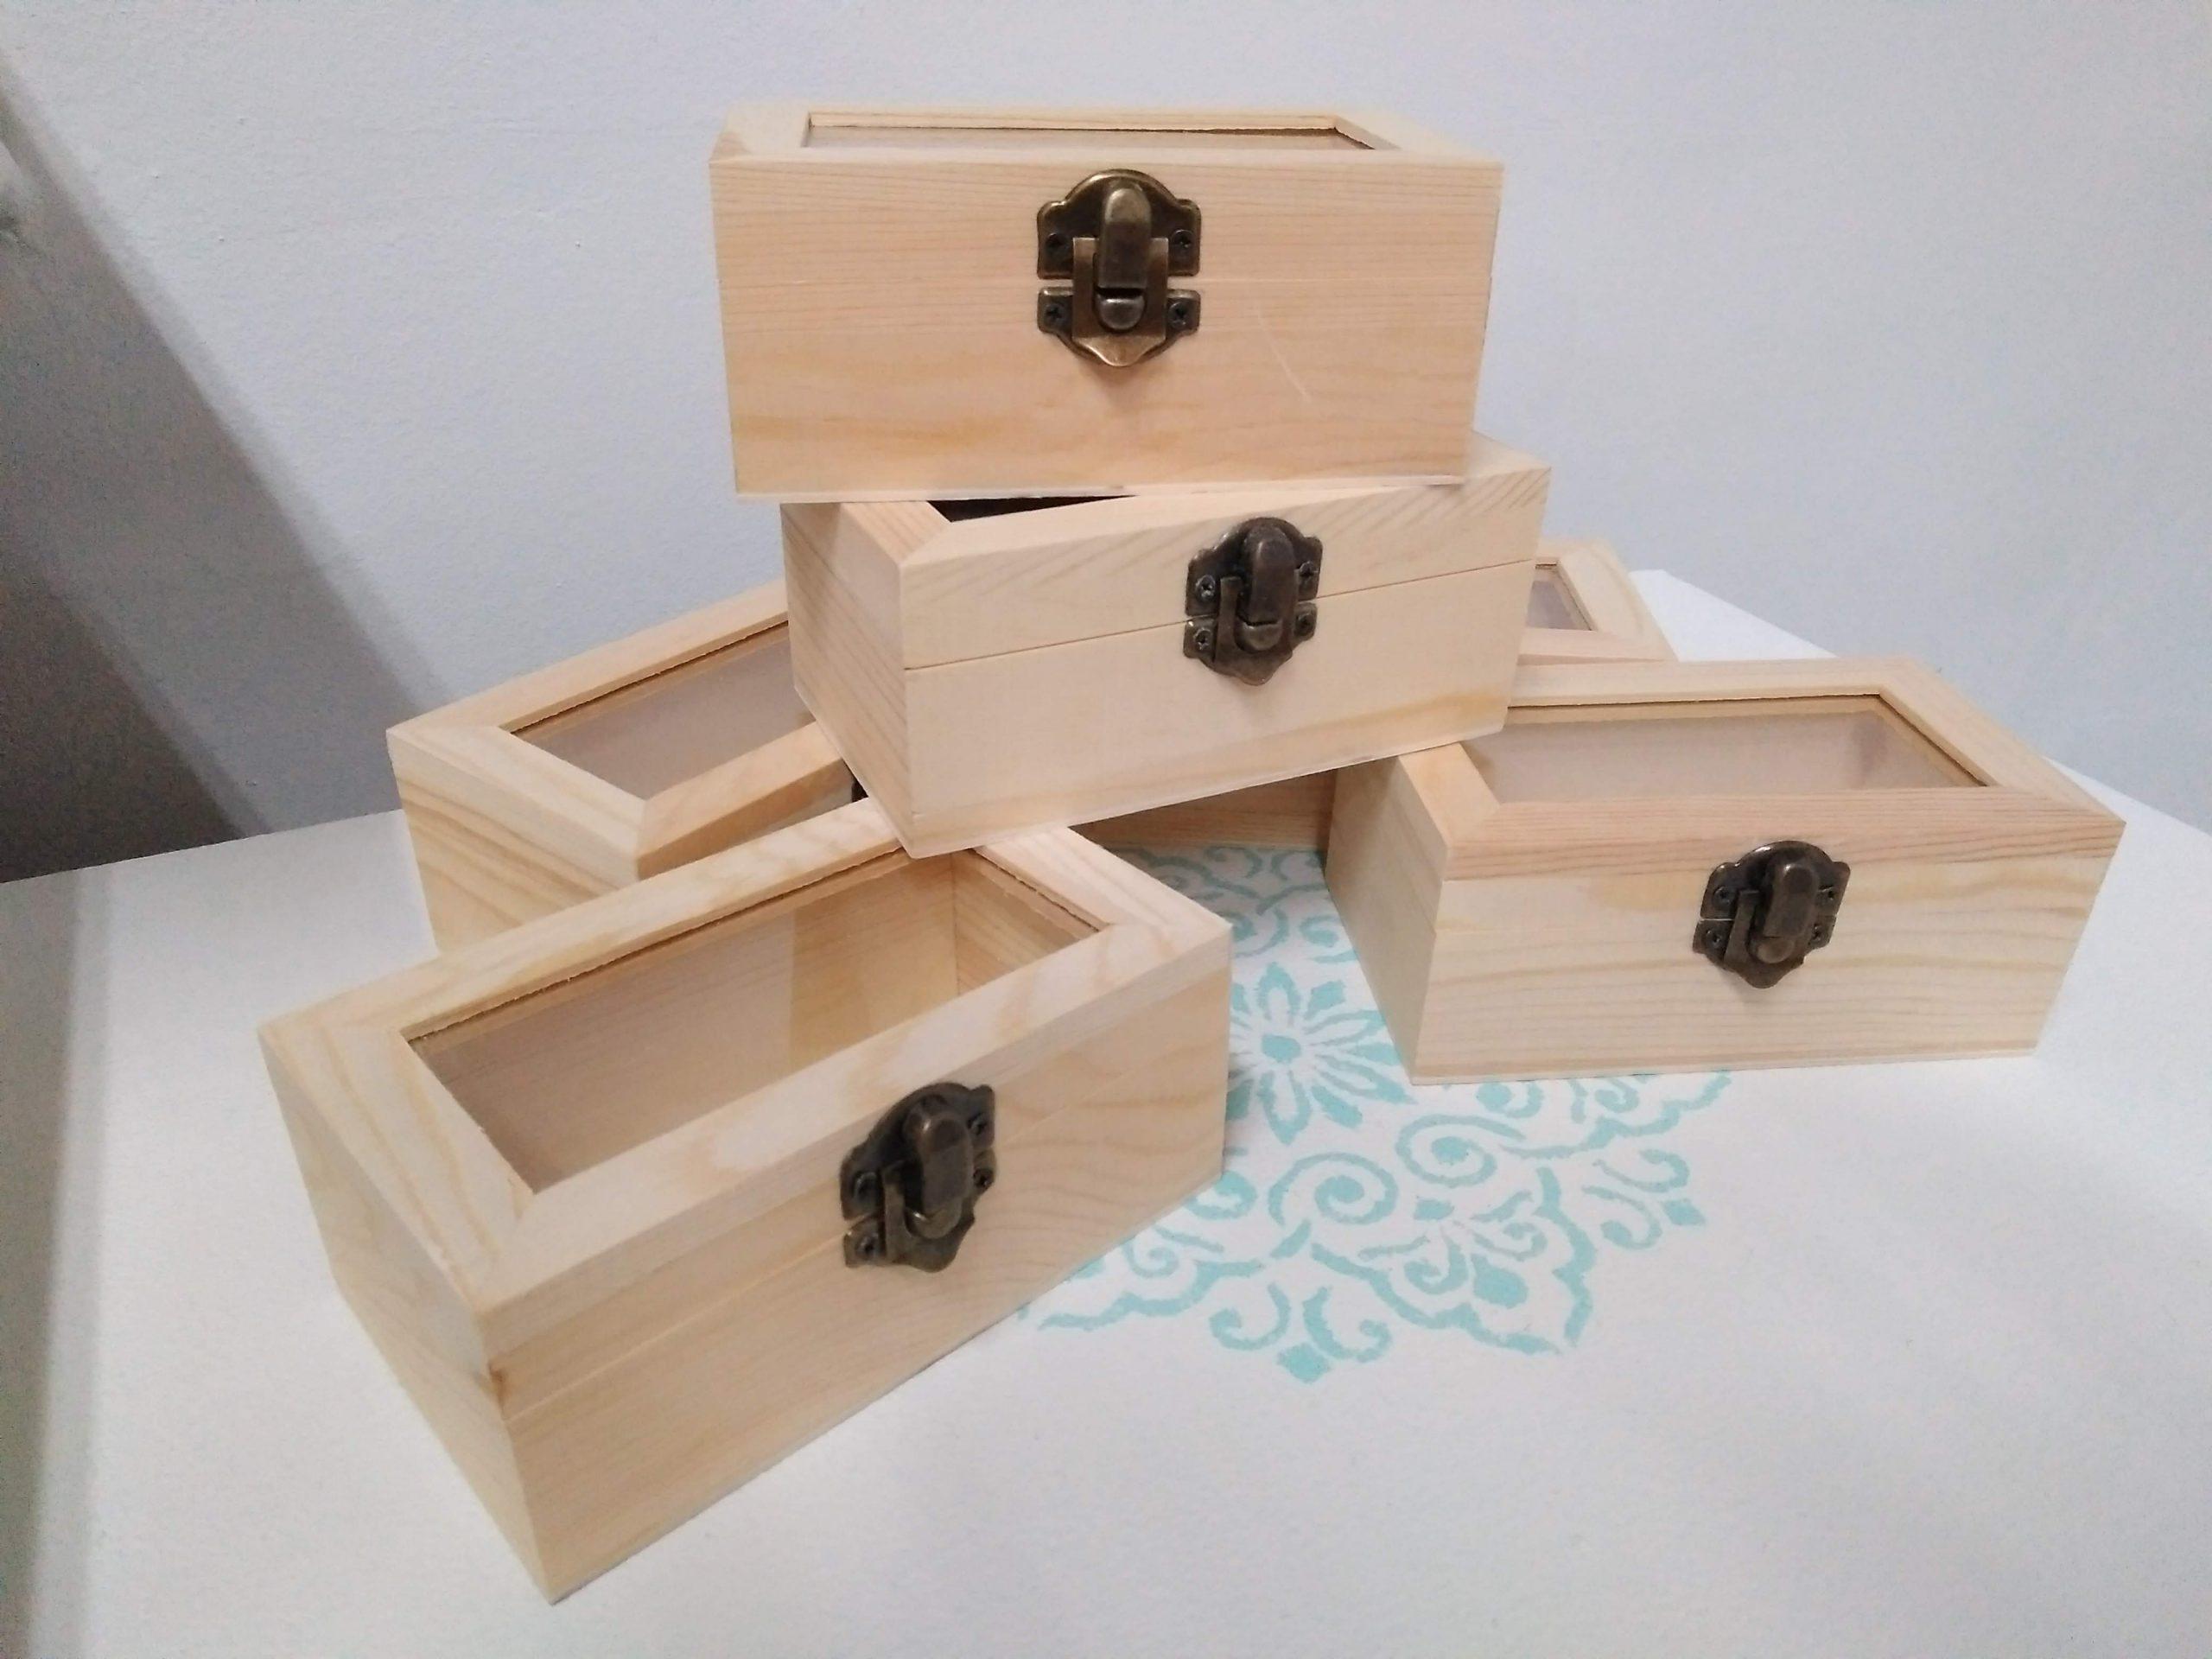 Soportes de manualidadesCajas de madera